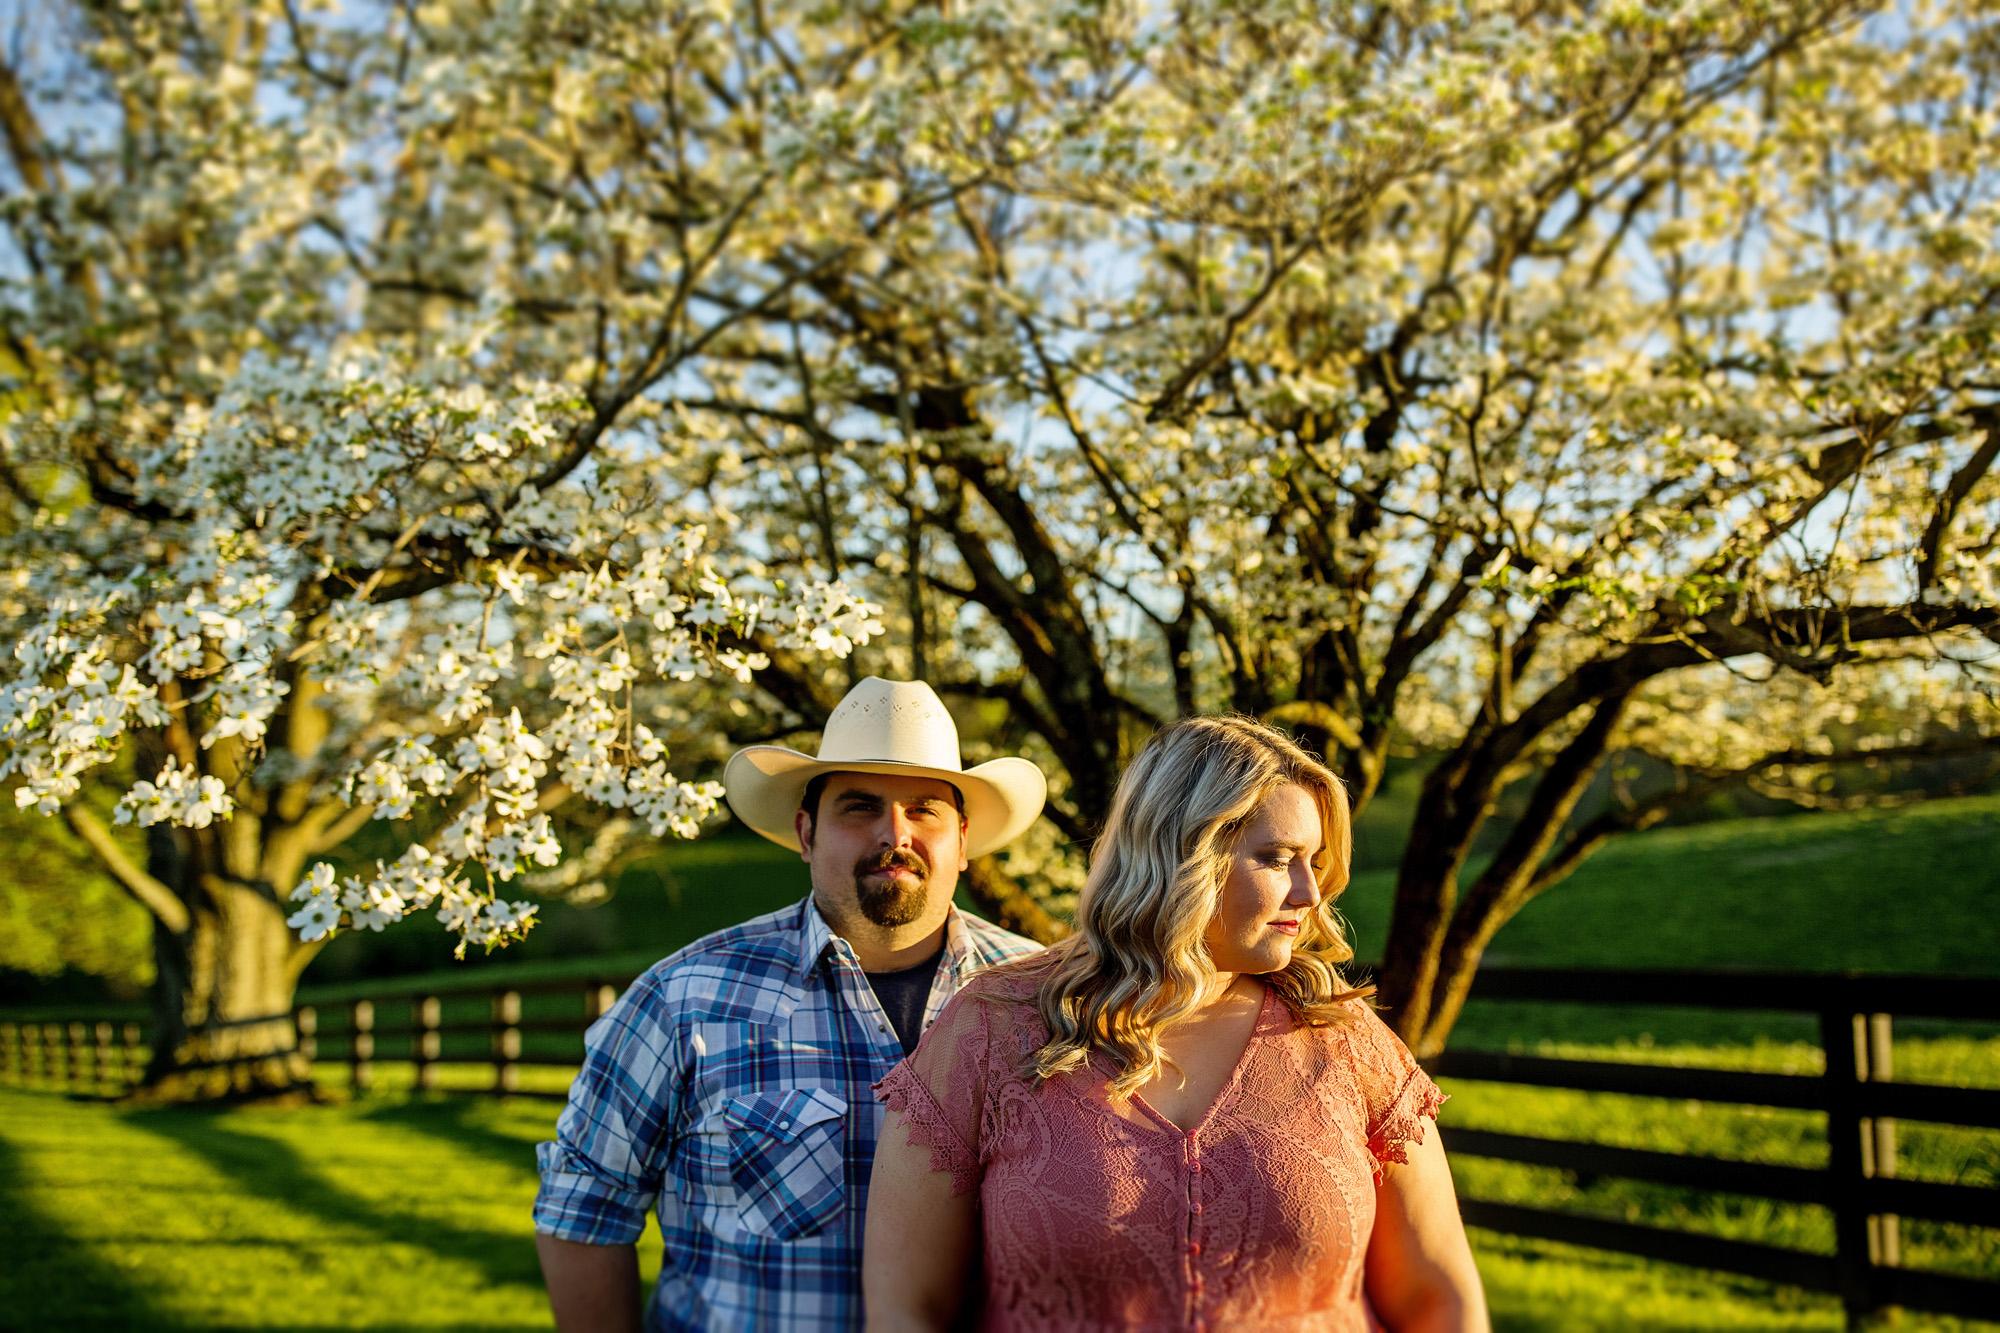 Seriously_Sabrina_Photography_Lexington_Kentucky_Sunset_Farm_Engagement_Cody_Sara_22.jpg